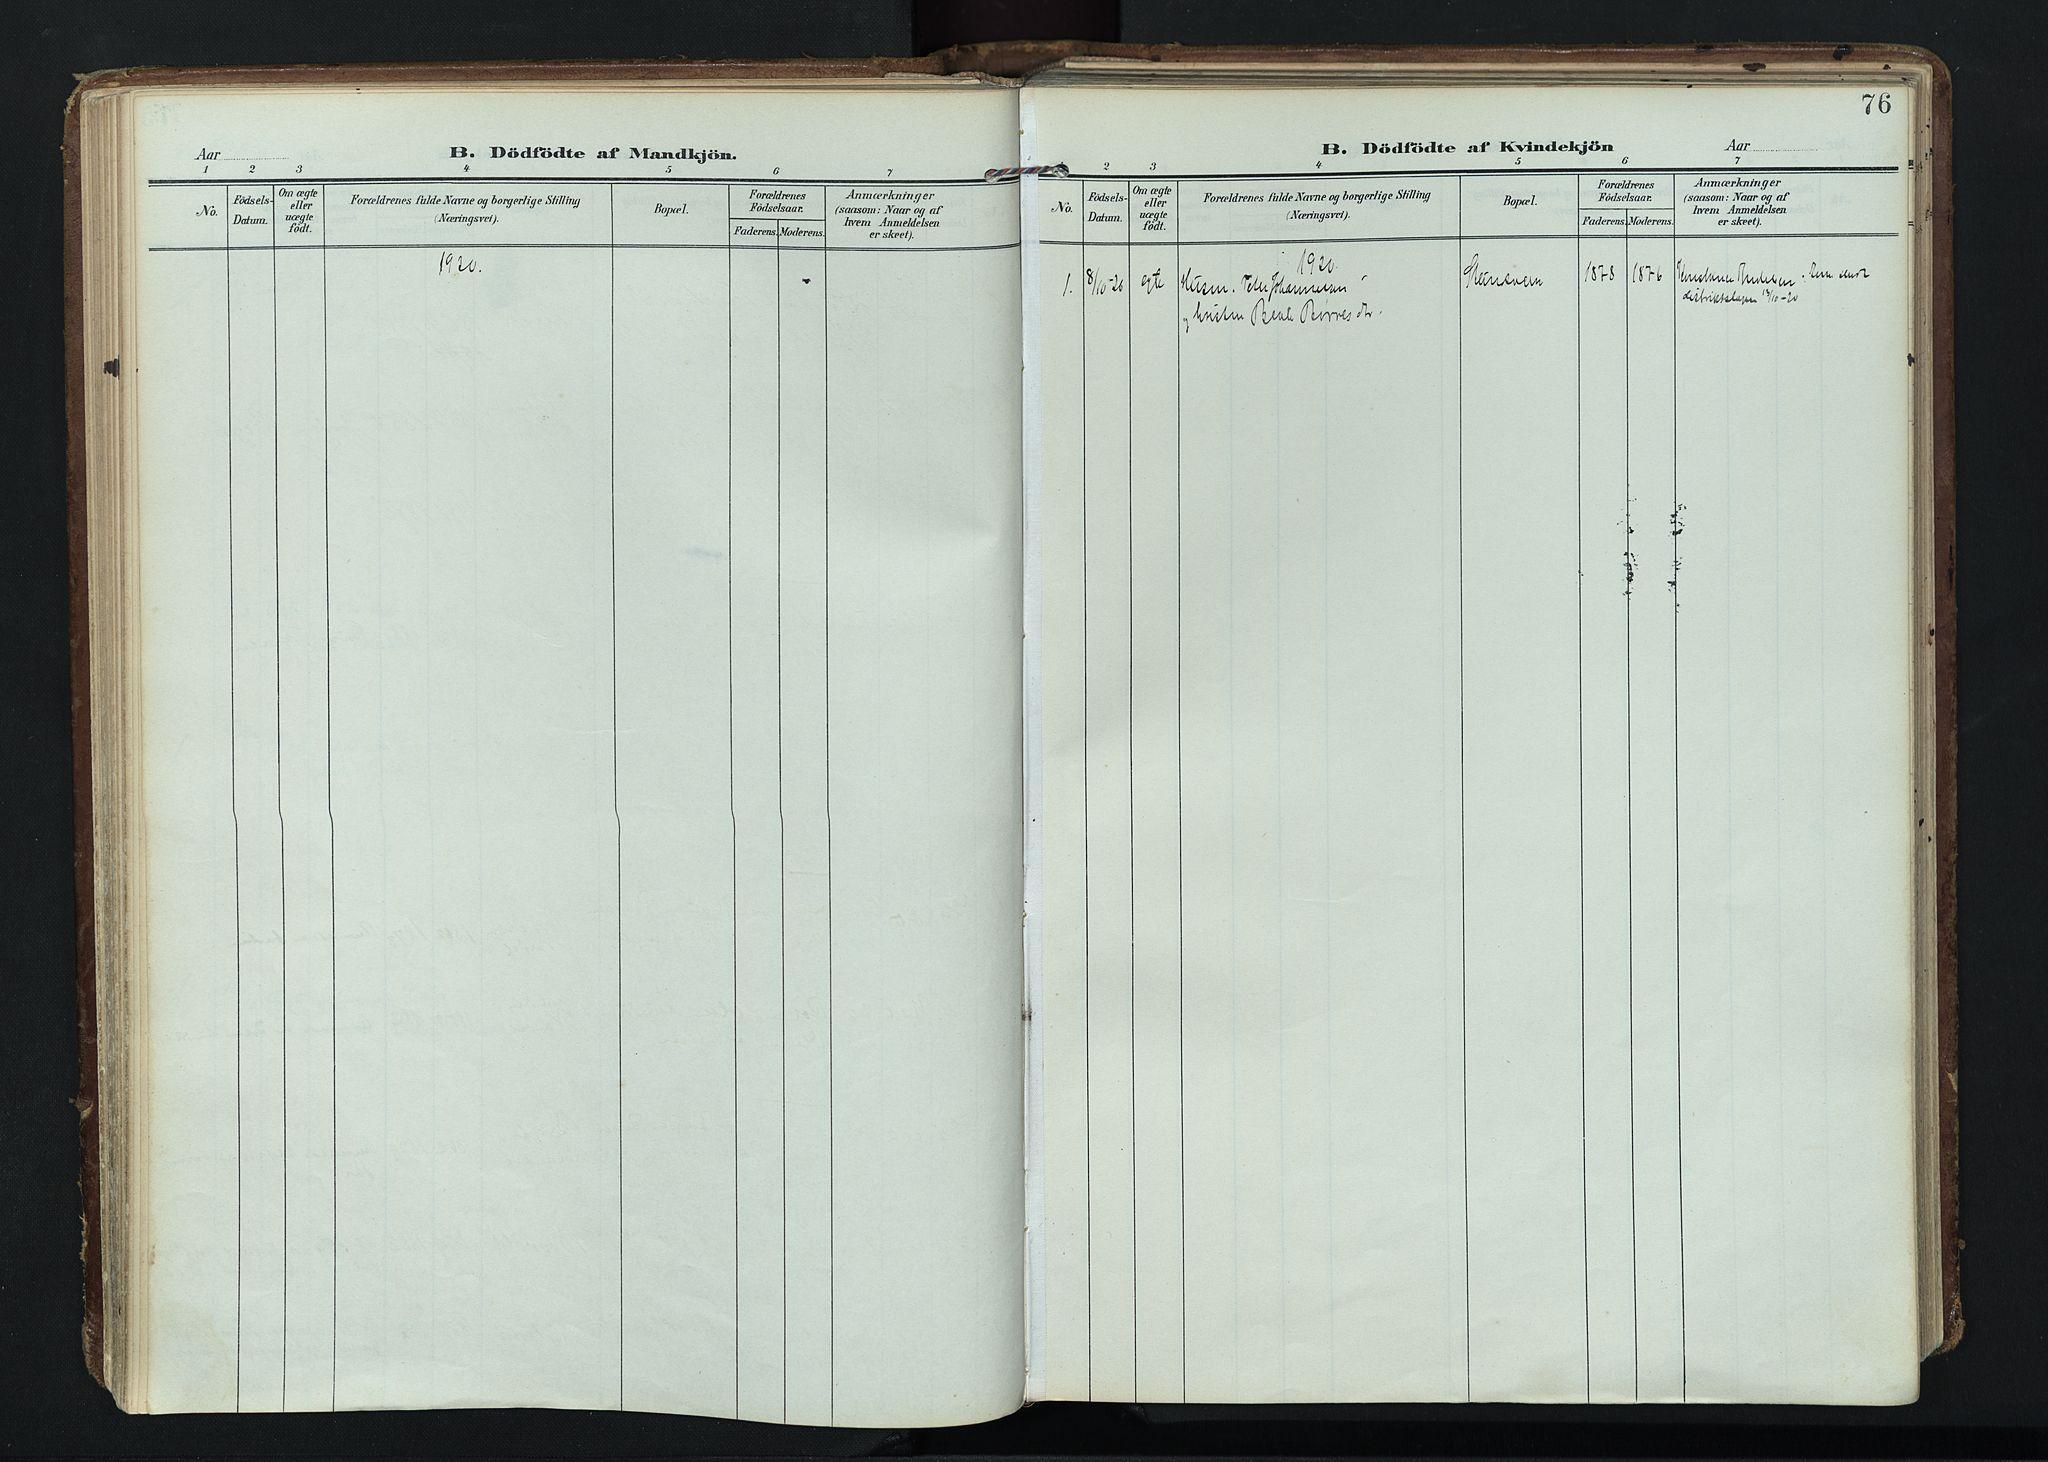 SAH, Vardal prestekontor, H/Ha/Haa/L0020: Ministerialbok nr. 20, 1907-1921, s. 76